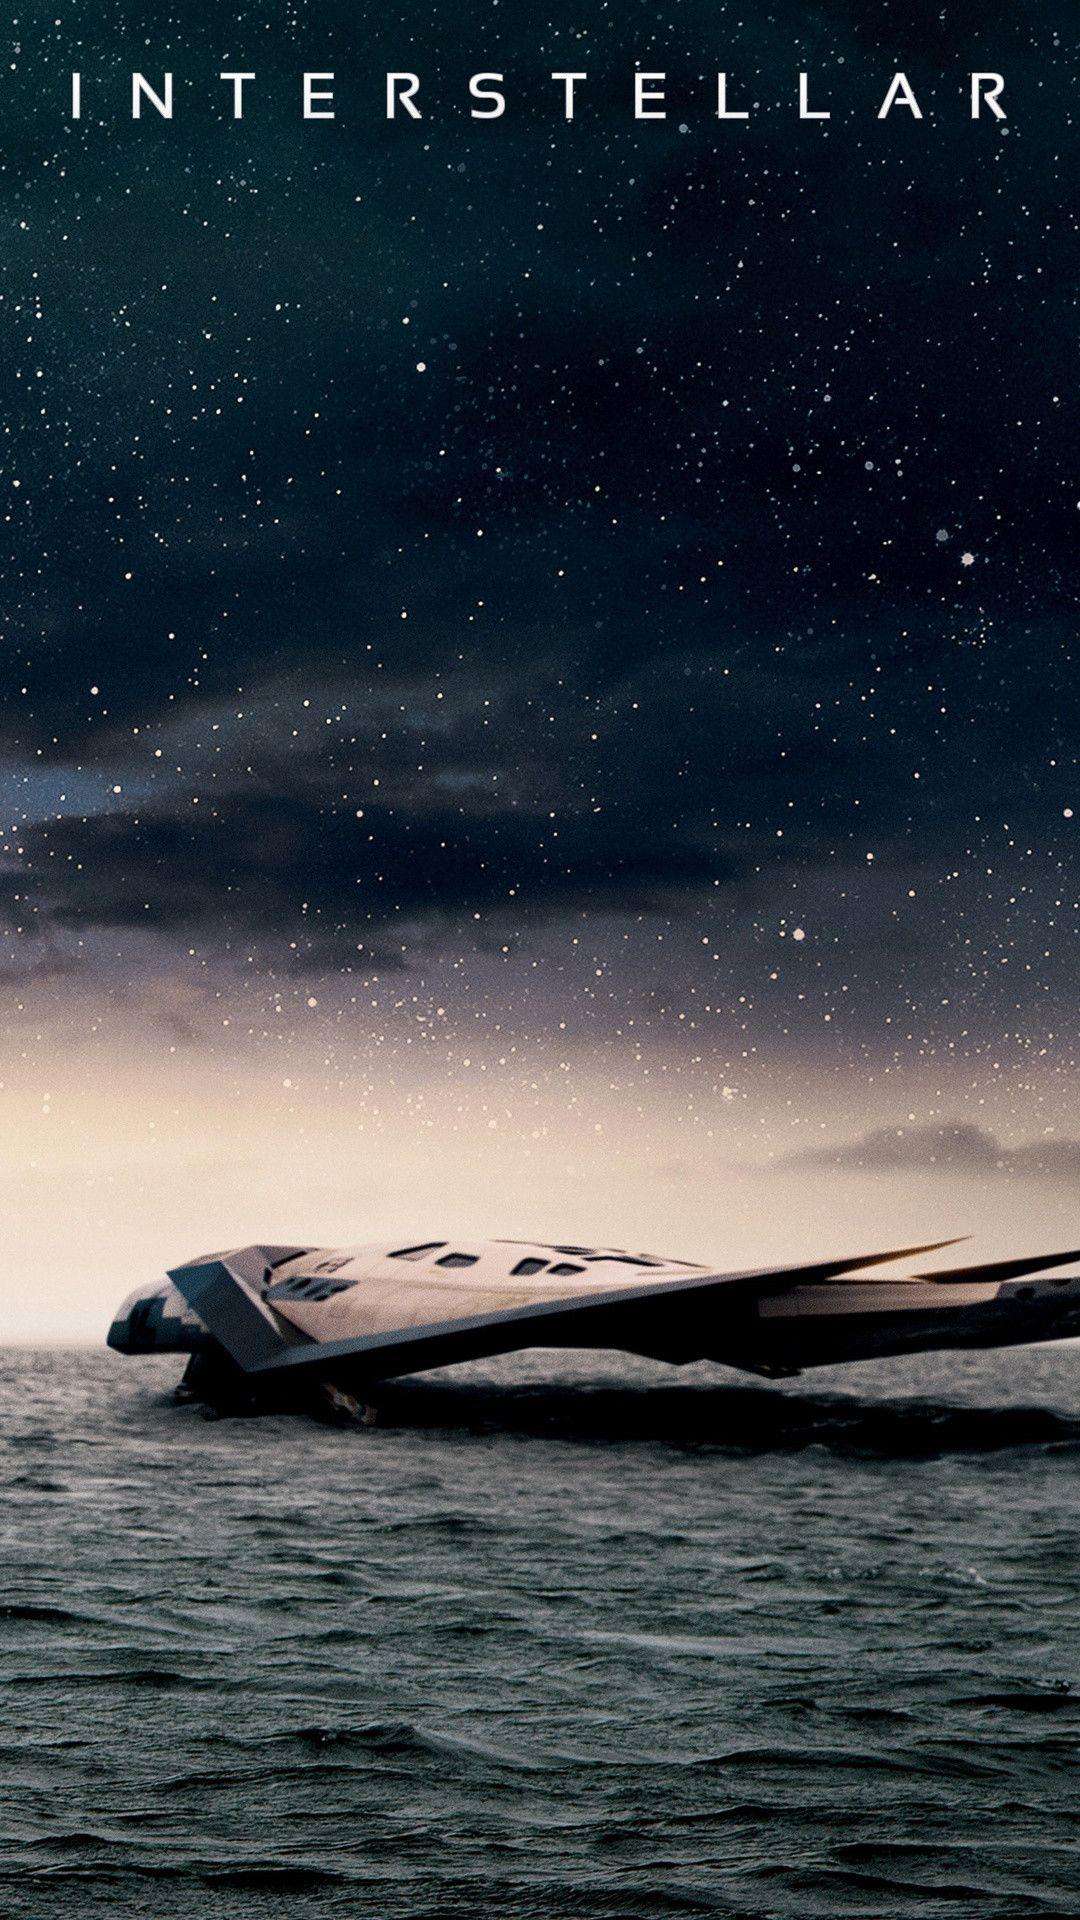 1080x1920 Interstellar The Movie Mobile Hd Wallpaper Interstellar Interstellar Movie Space Movies